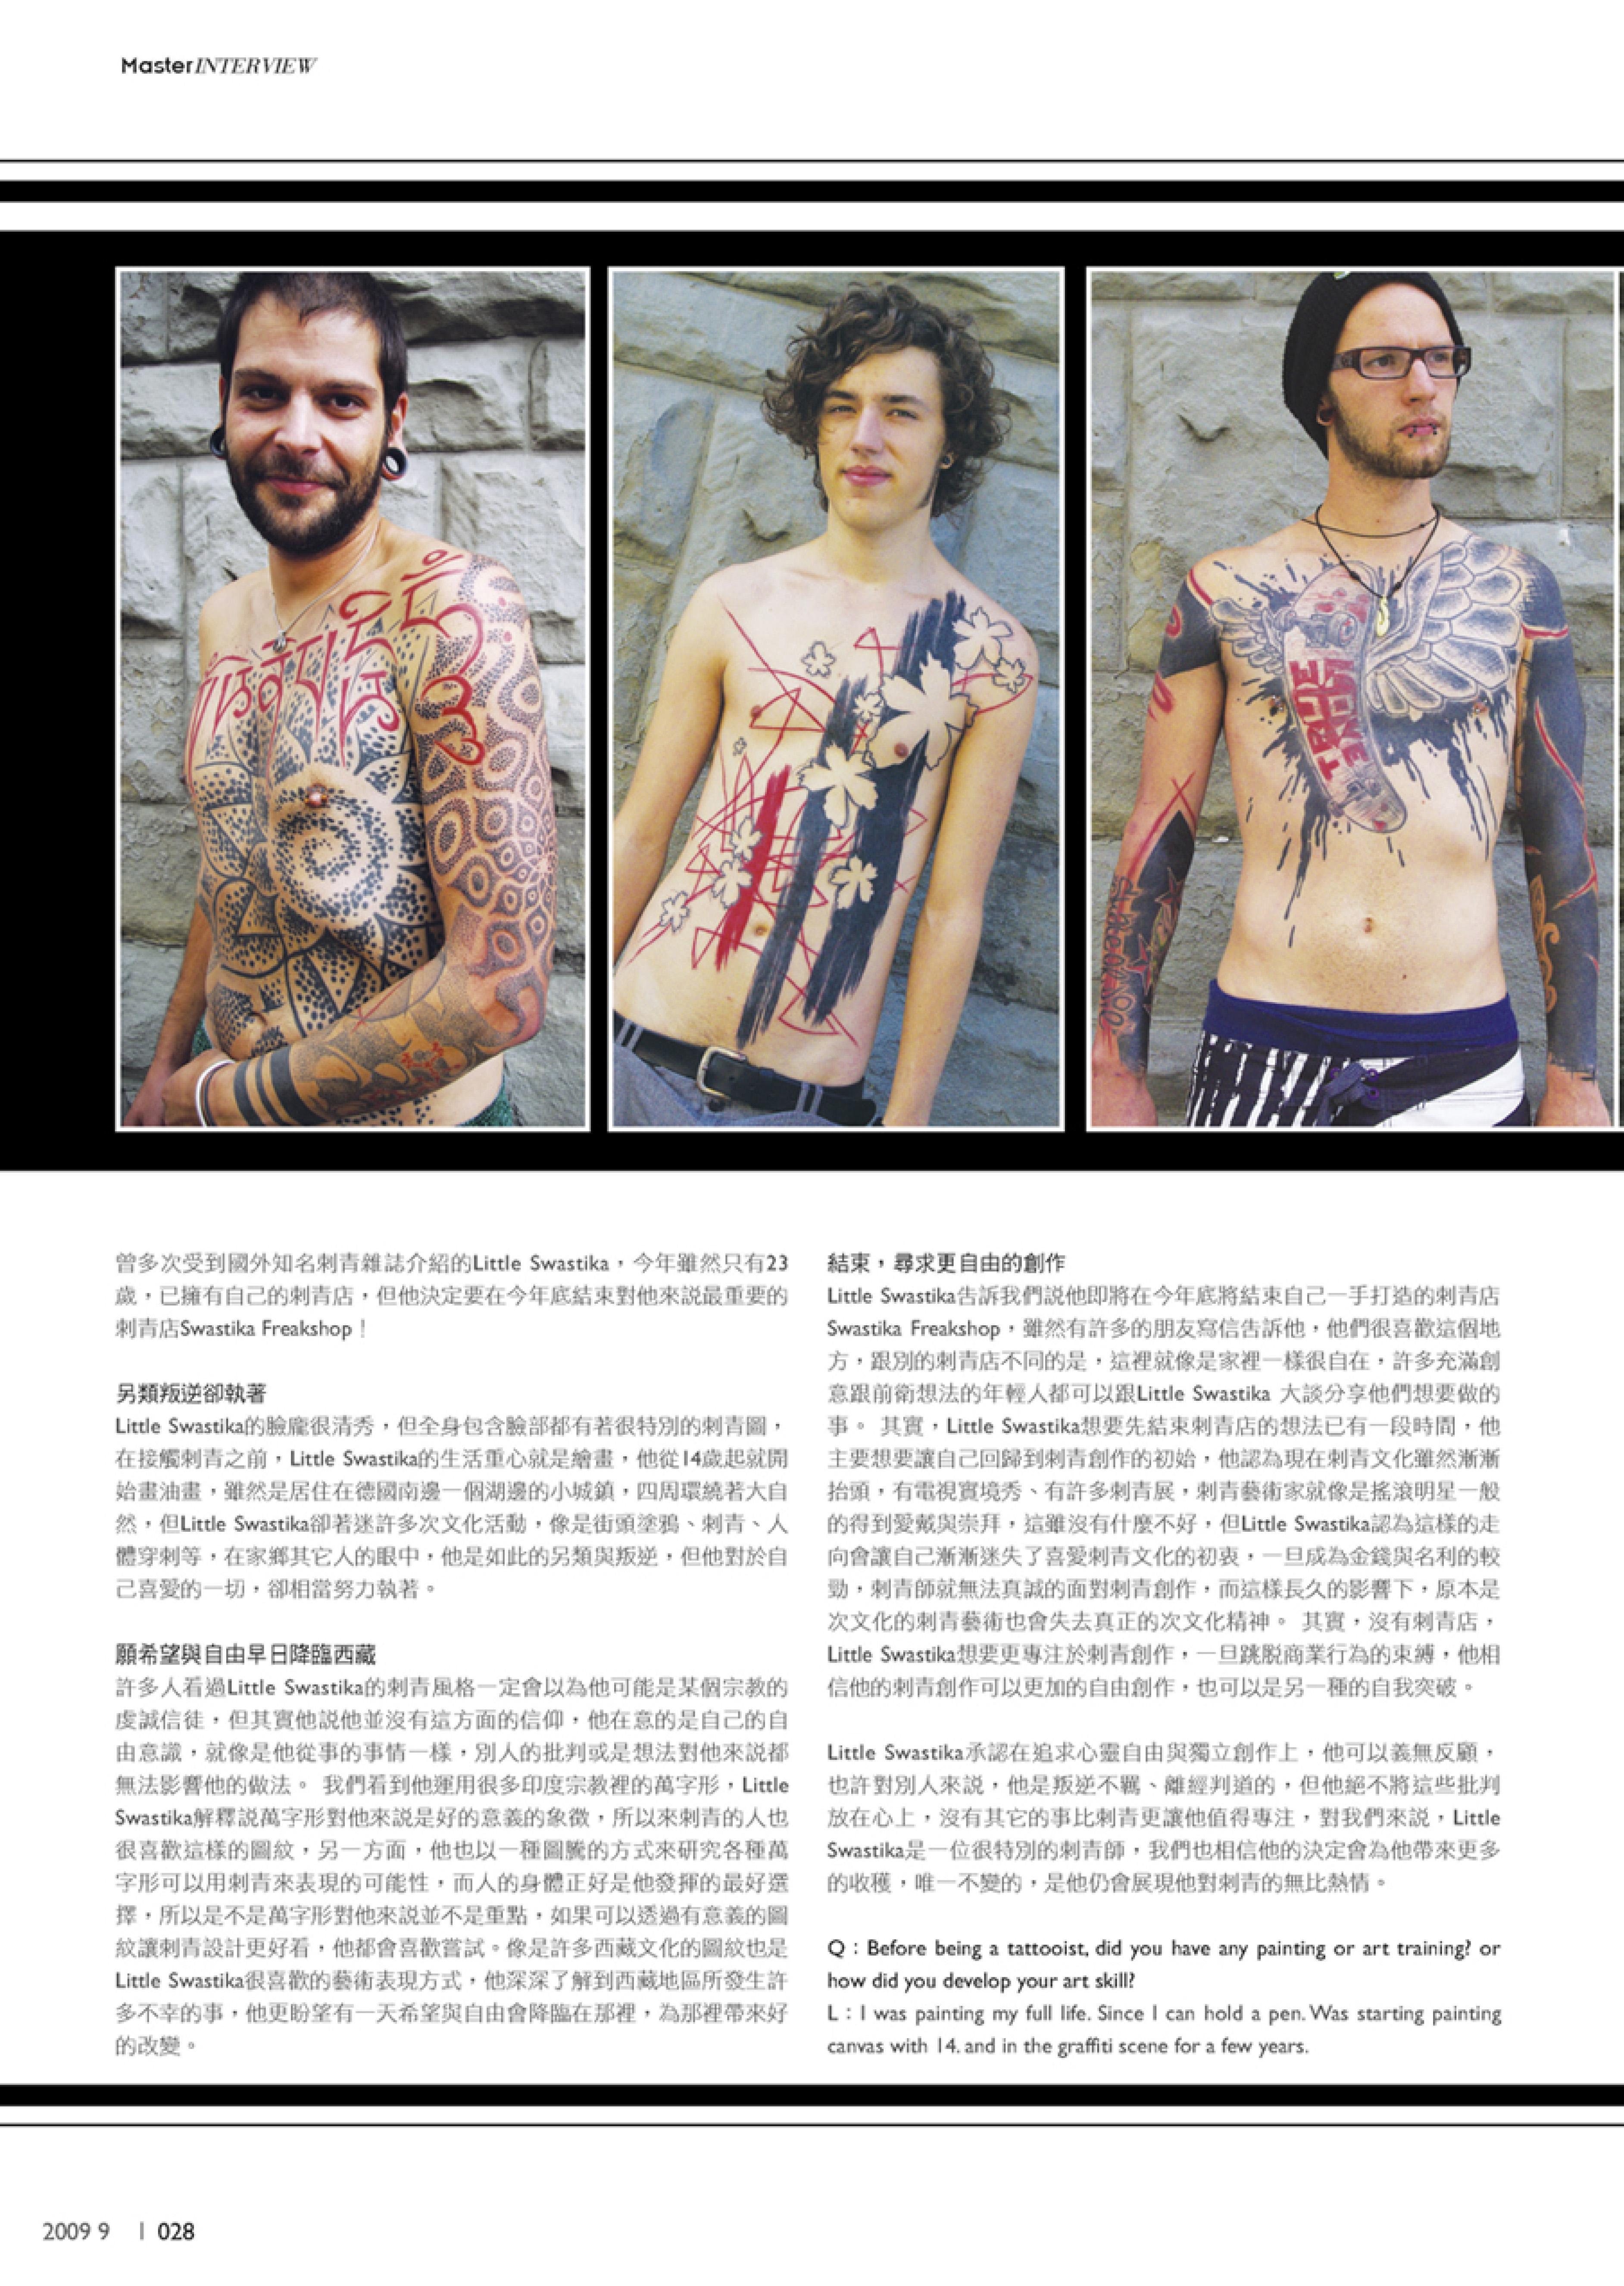 tattoo-extreme-5